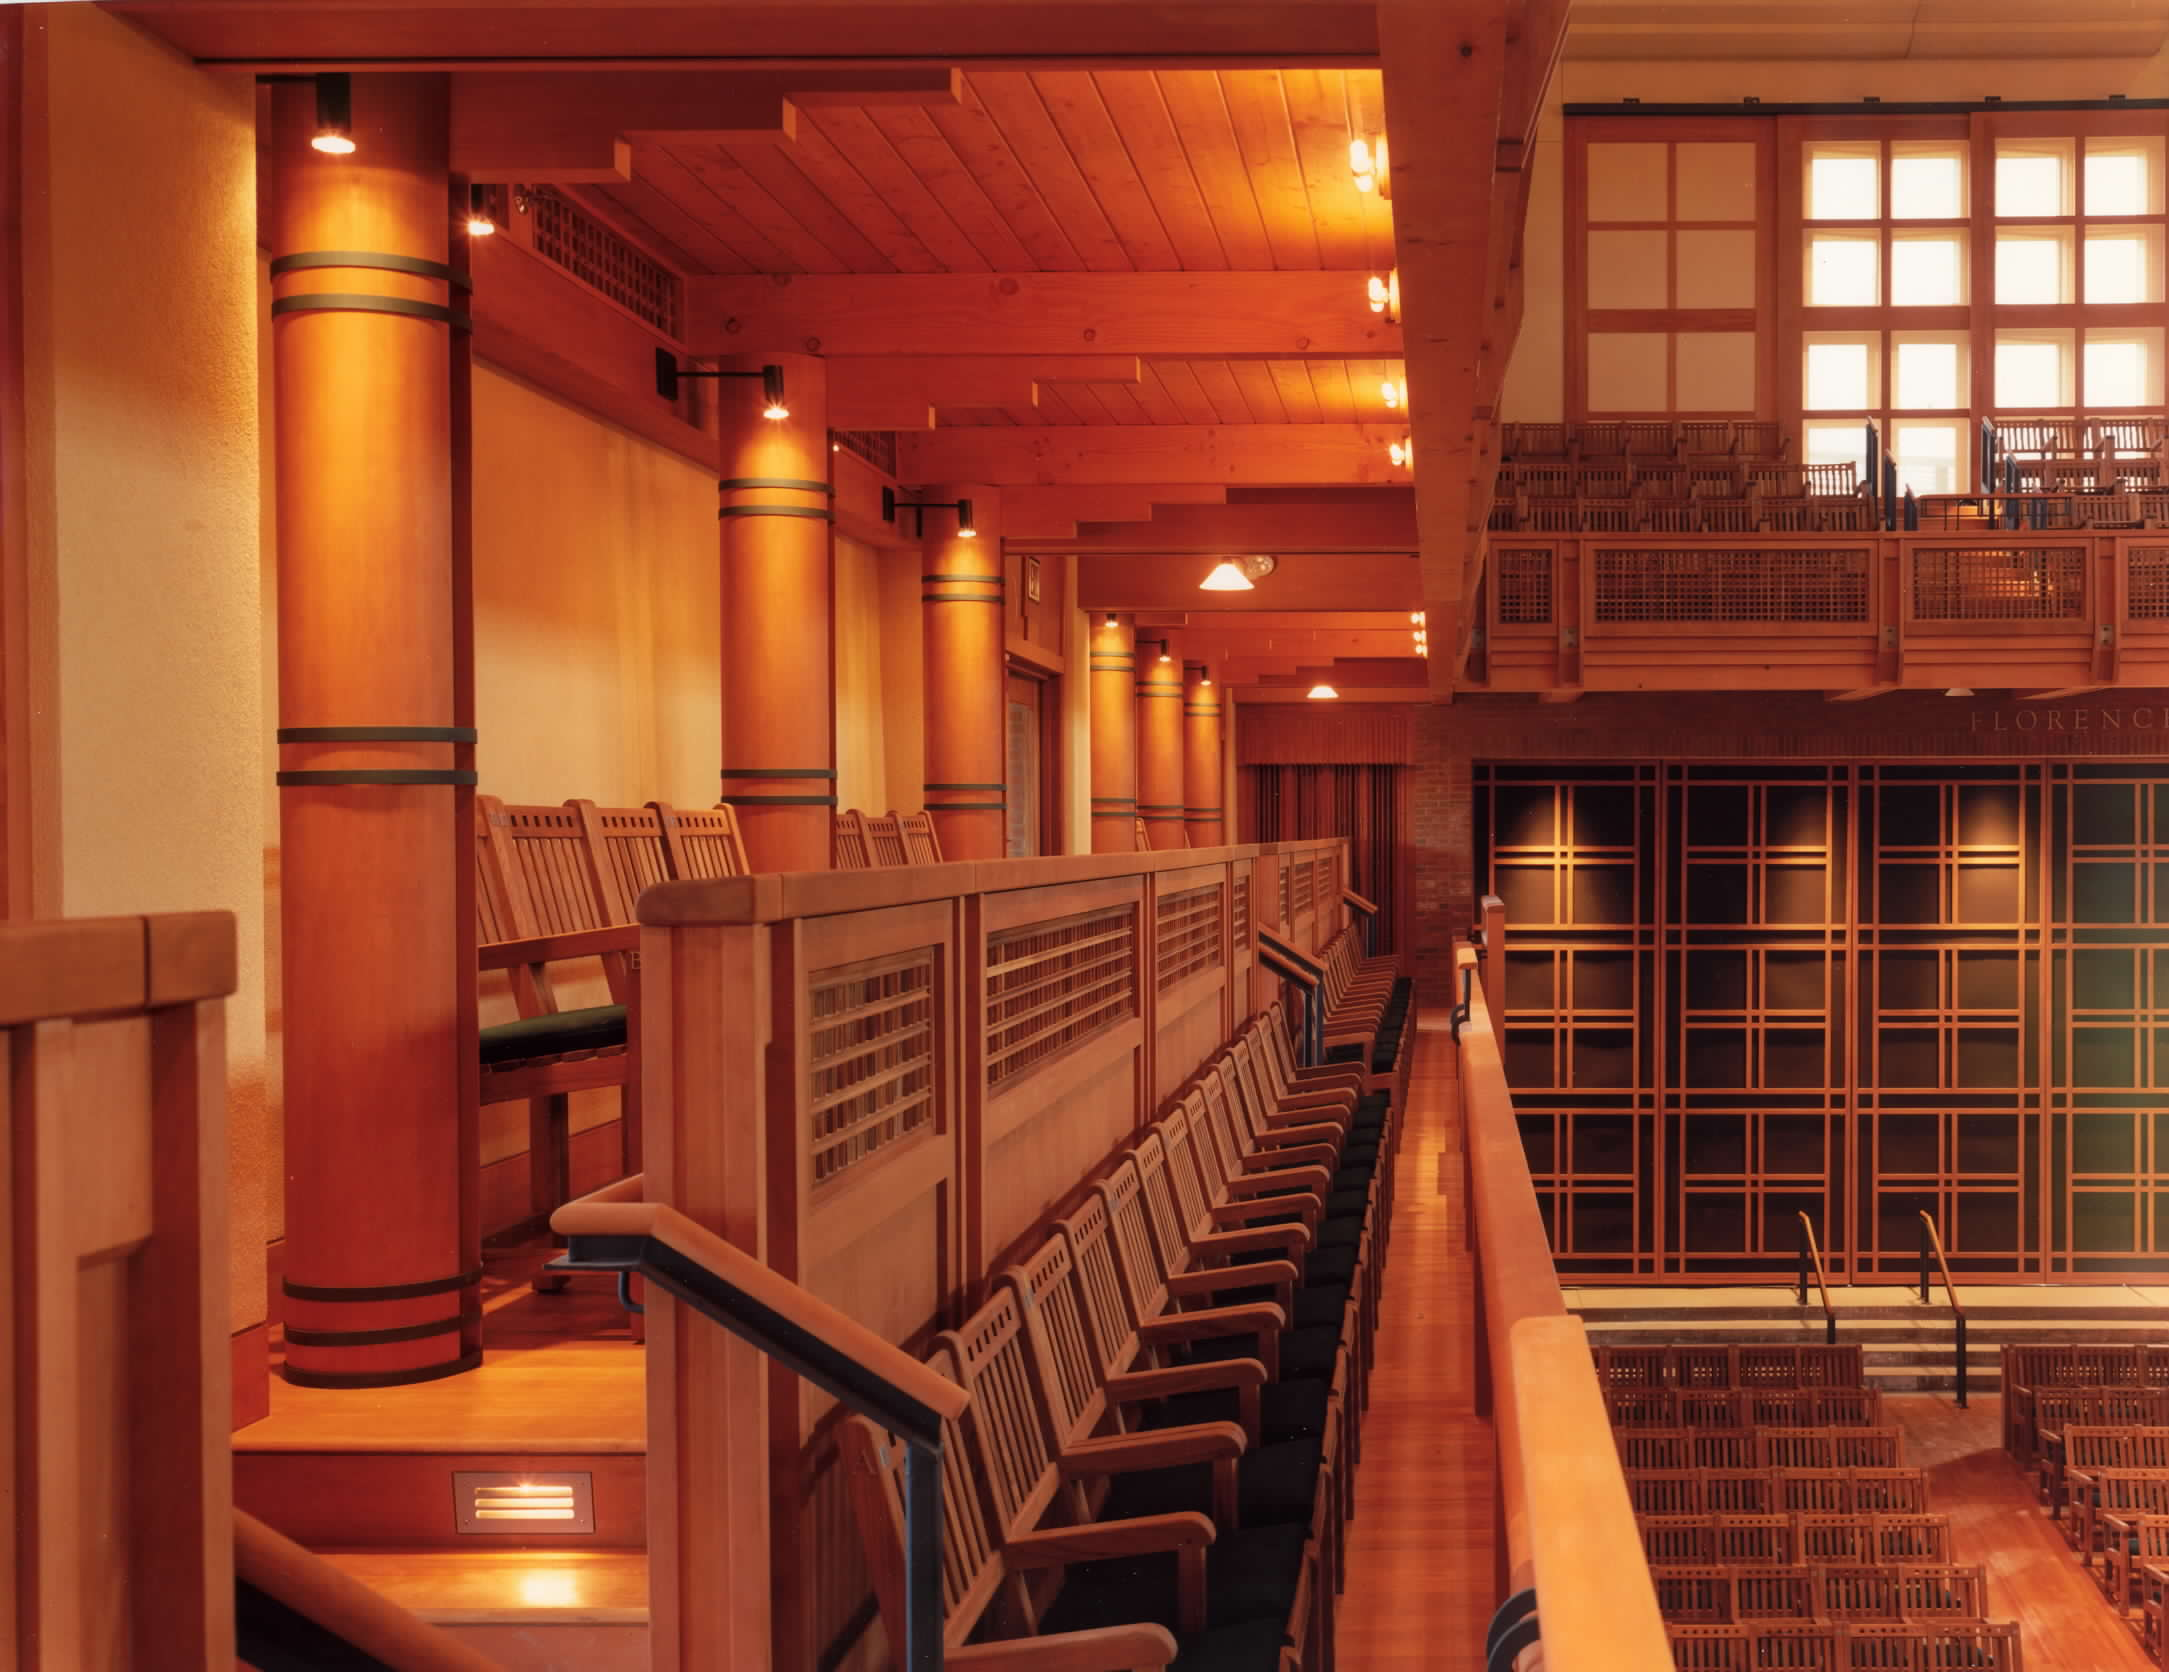 Tanglewood-Ozawa-Hall-Alan-Joslin-04.jpg